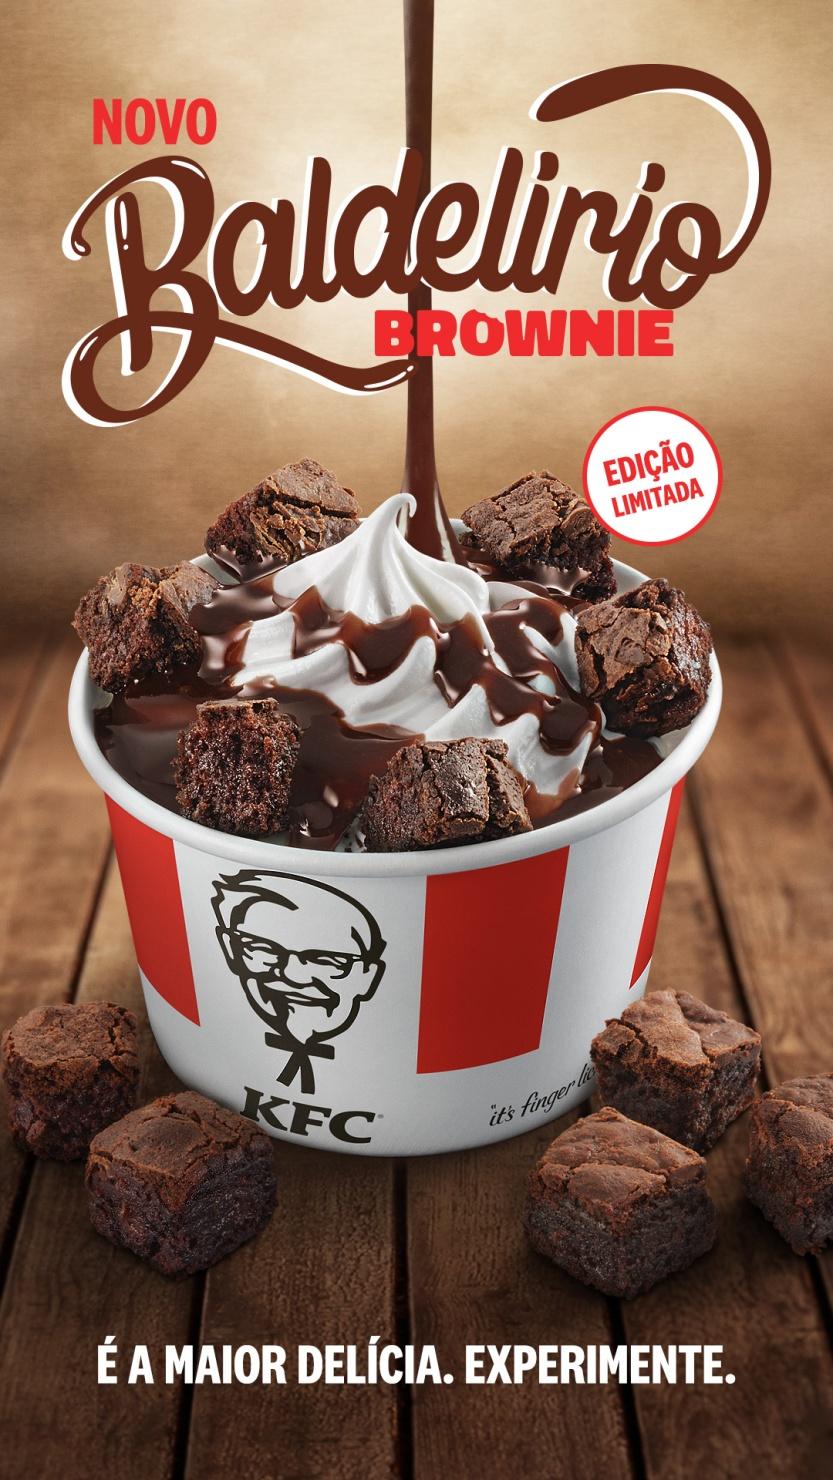 KFC_Baldelírio_Brownie